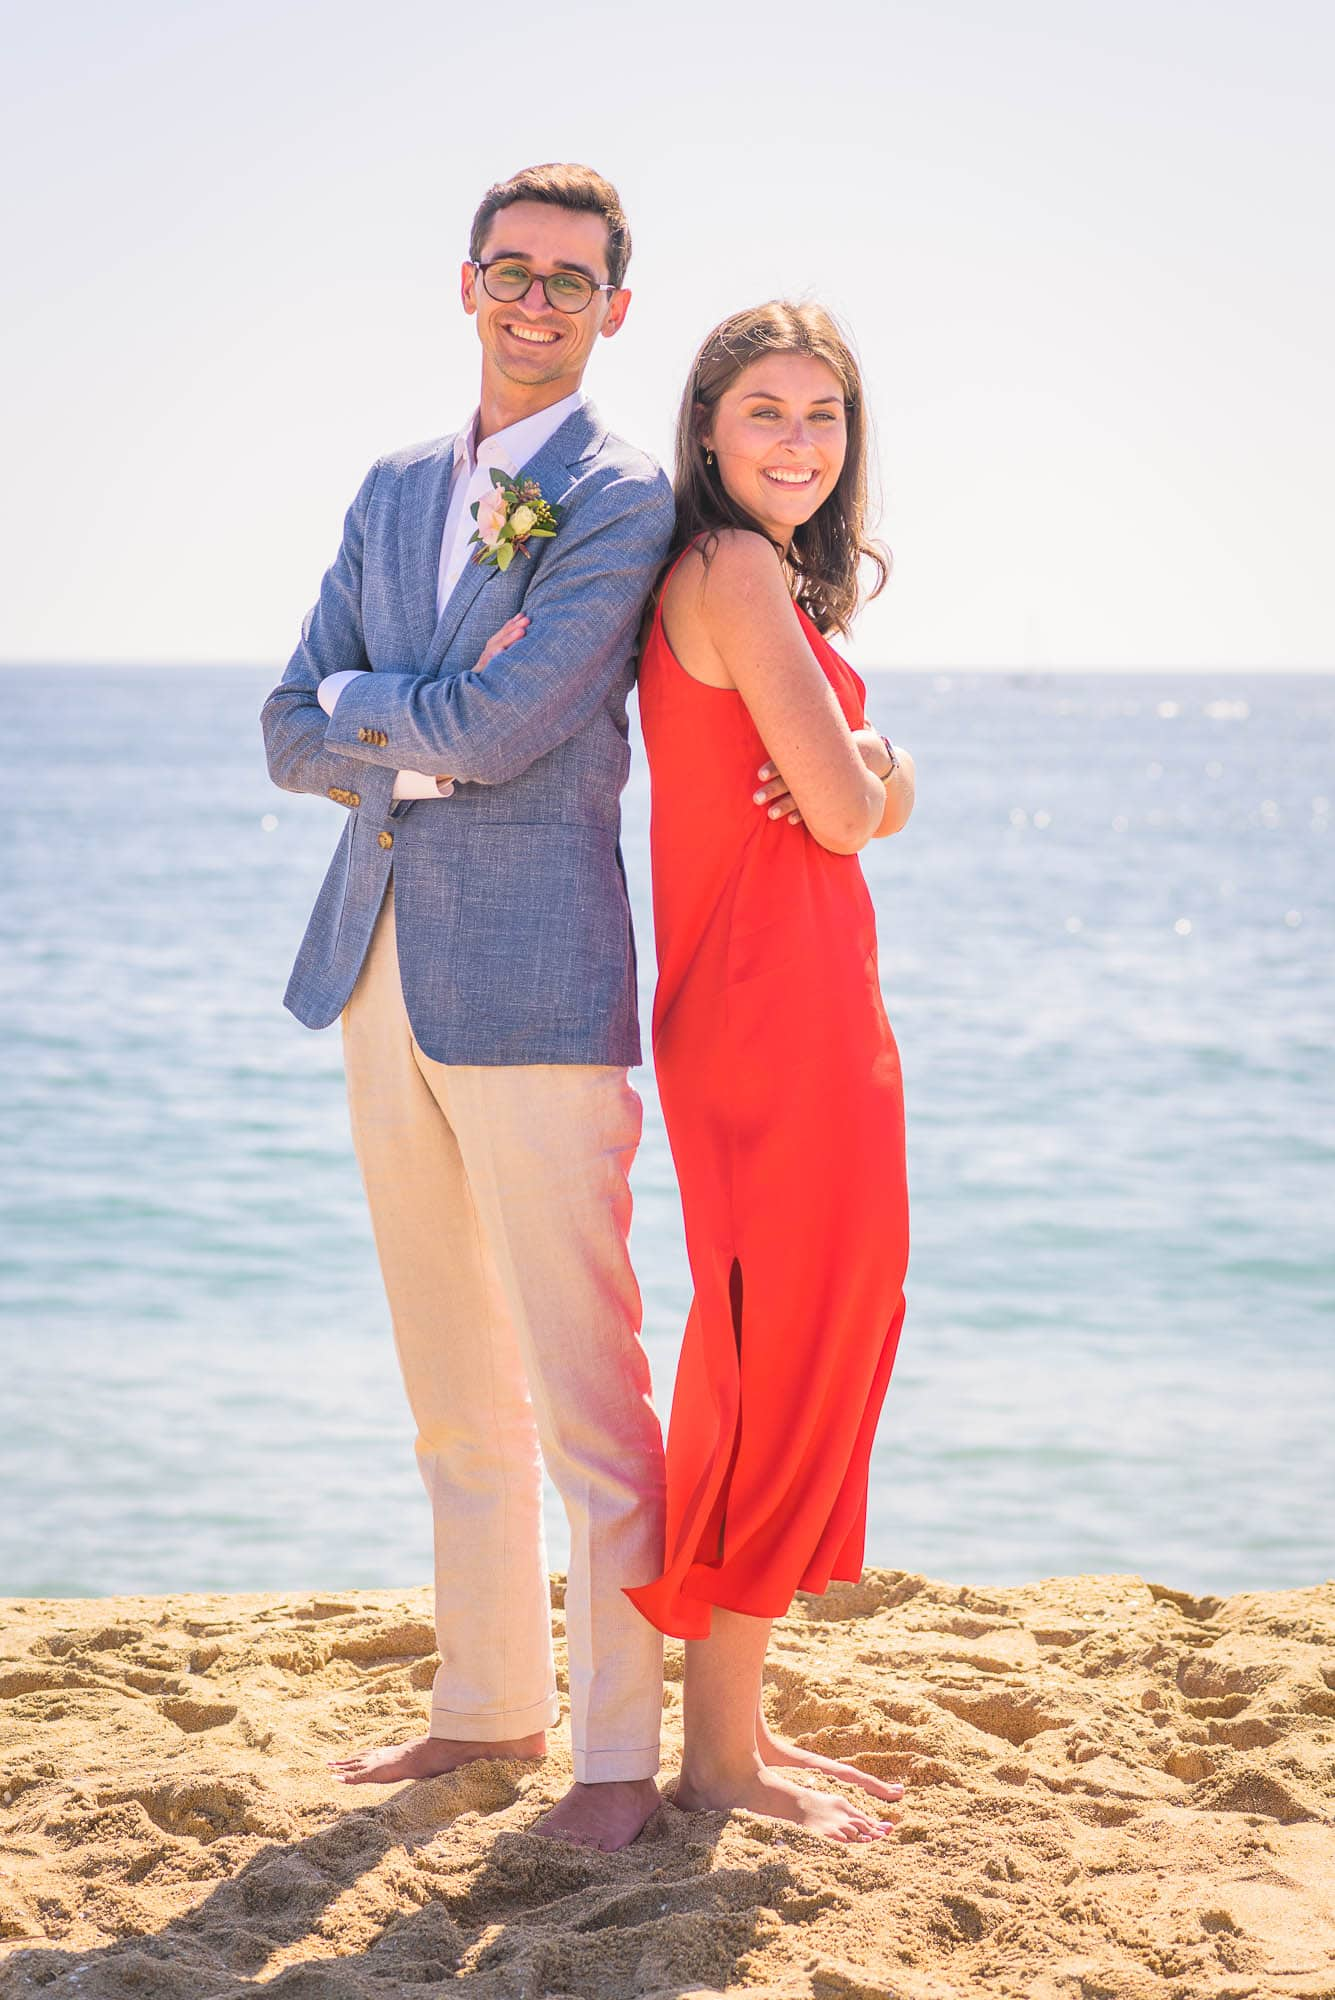 034_Alan_and_Heidi_Wedding_Verena_Andreas